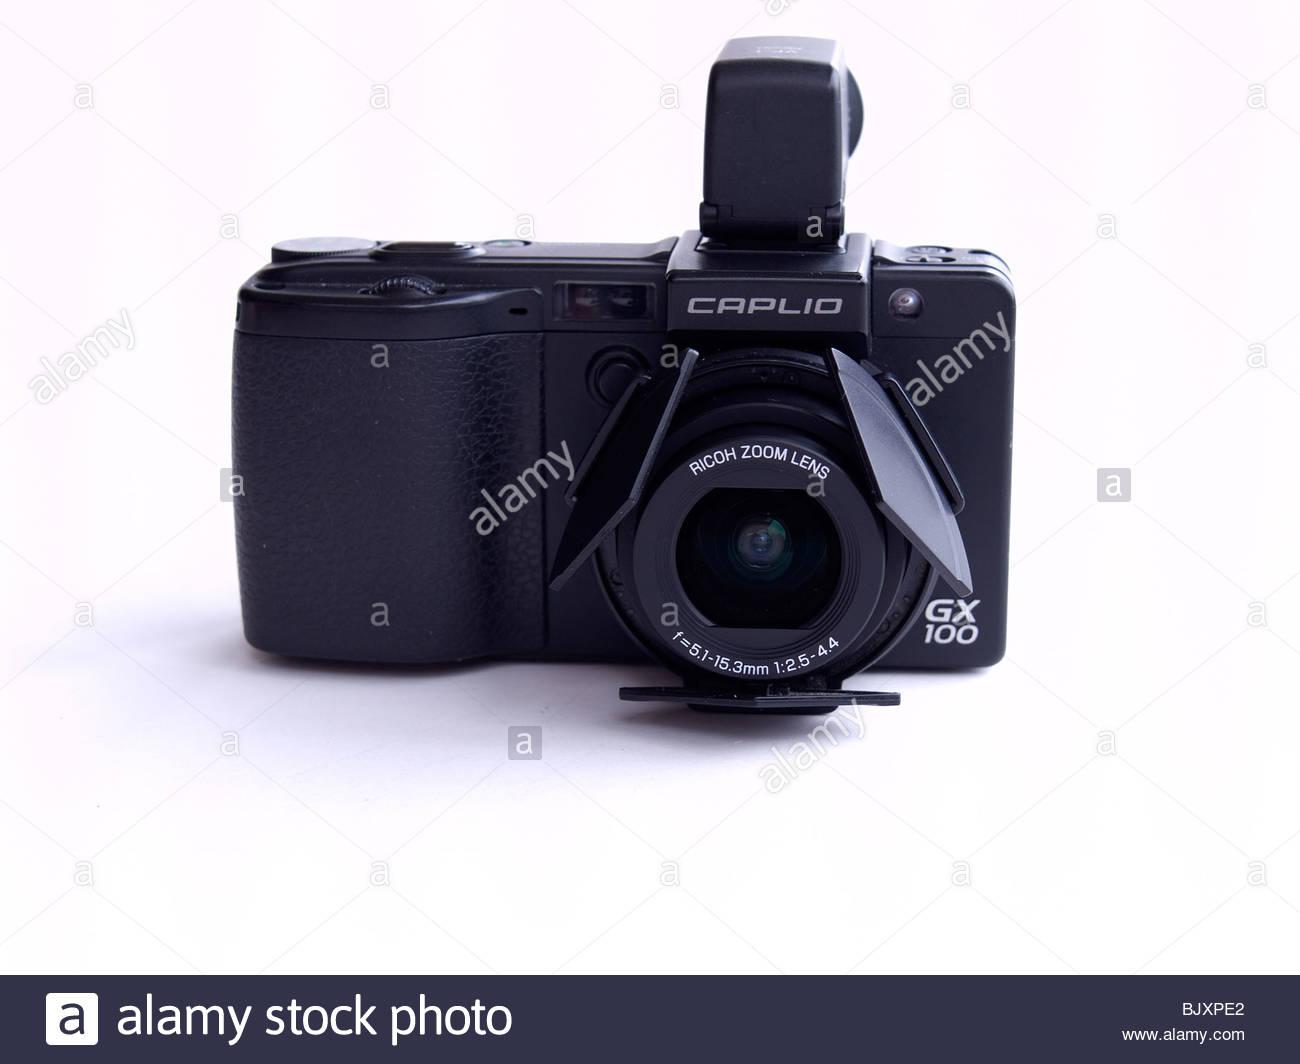 Ricoh Caplio GX100 compact digital camera on a white background 1300x1064